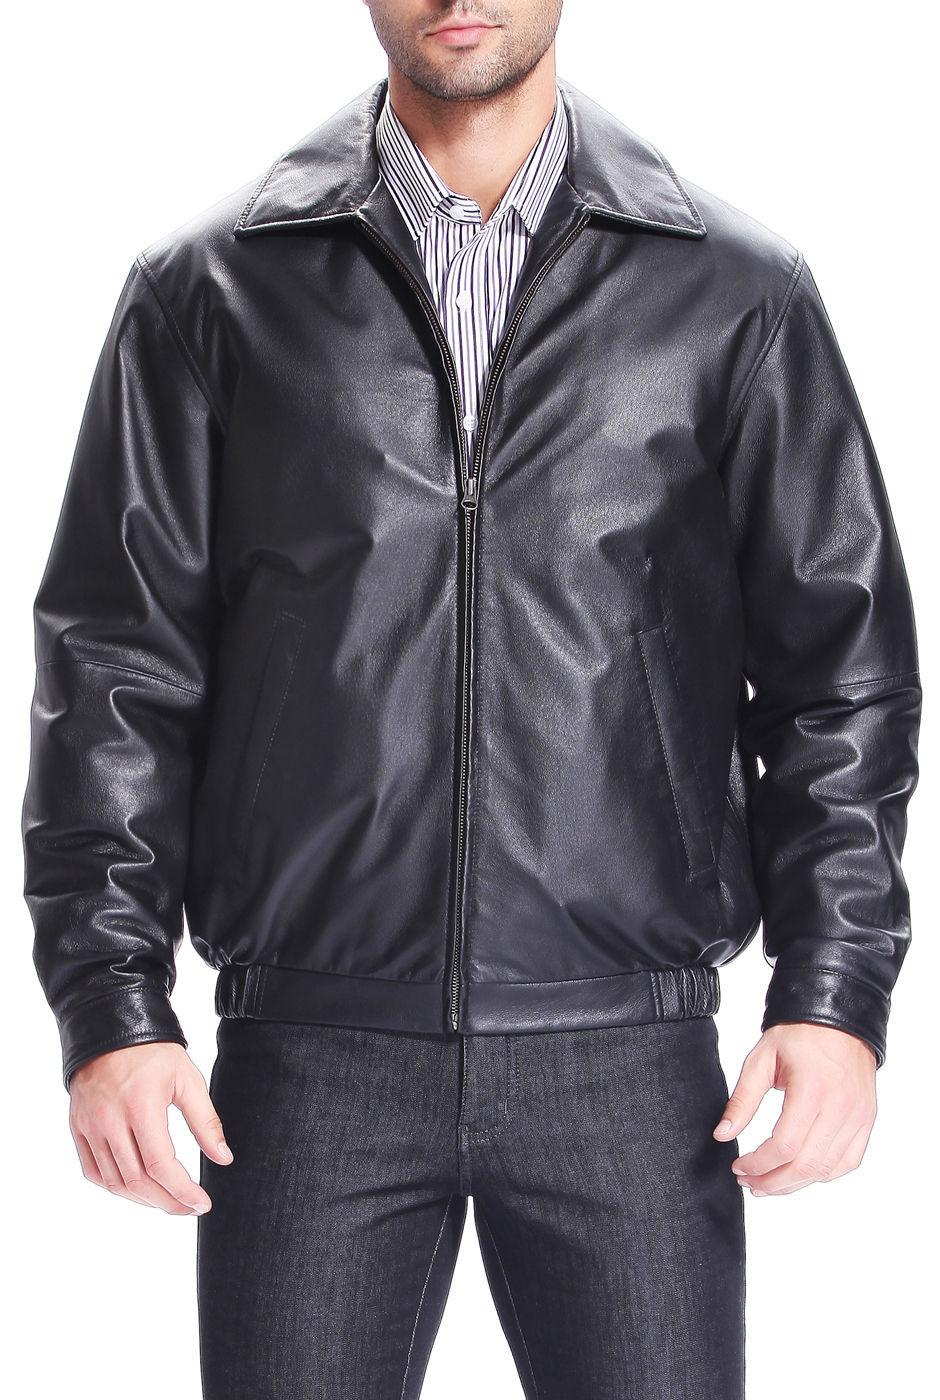 New Men's Stylish Lambskin Genuine Leather Motorcycle Biker Slim Fit Jacket  GN1